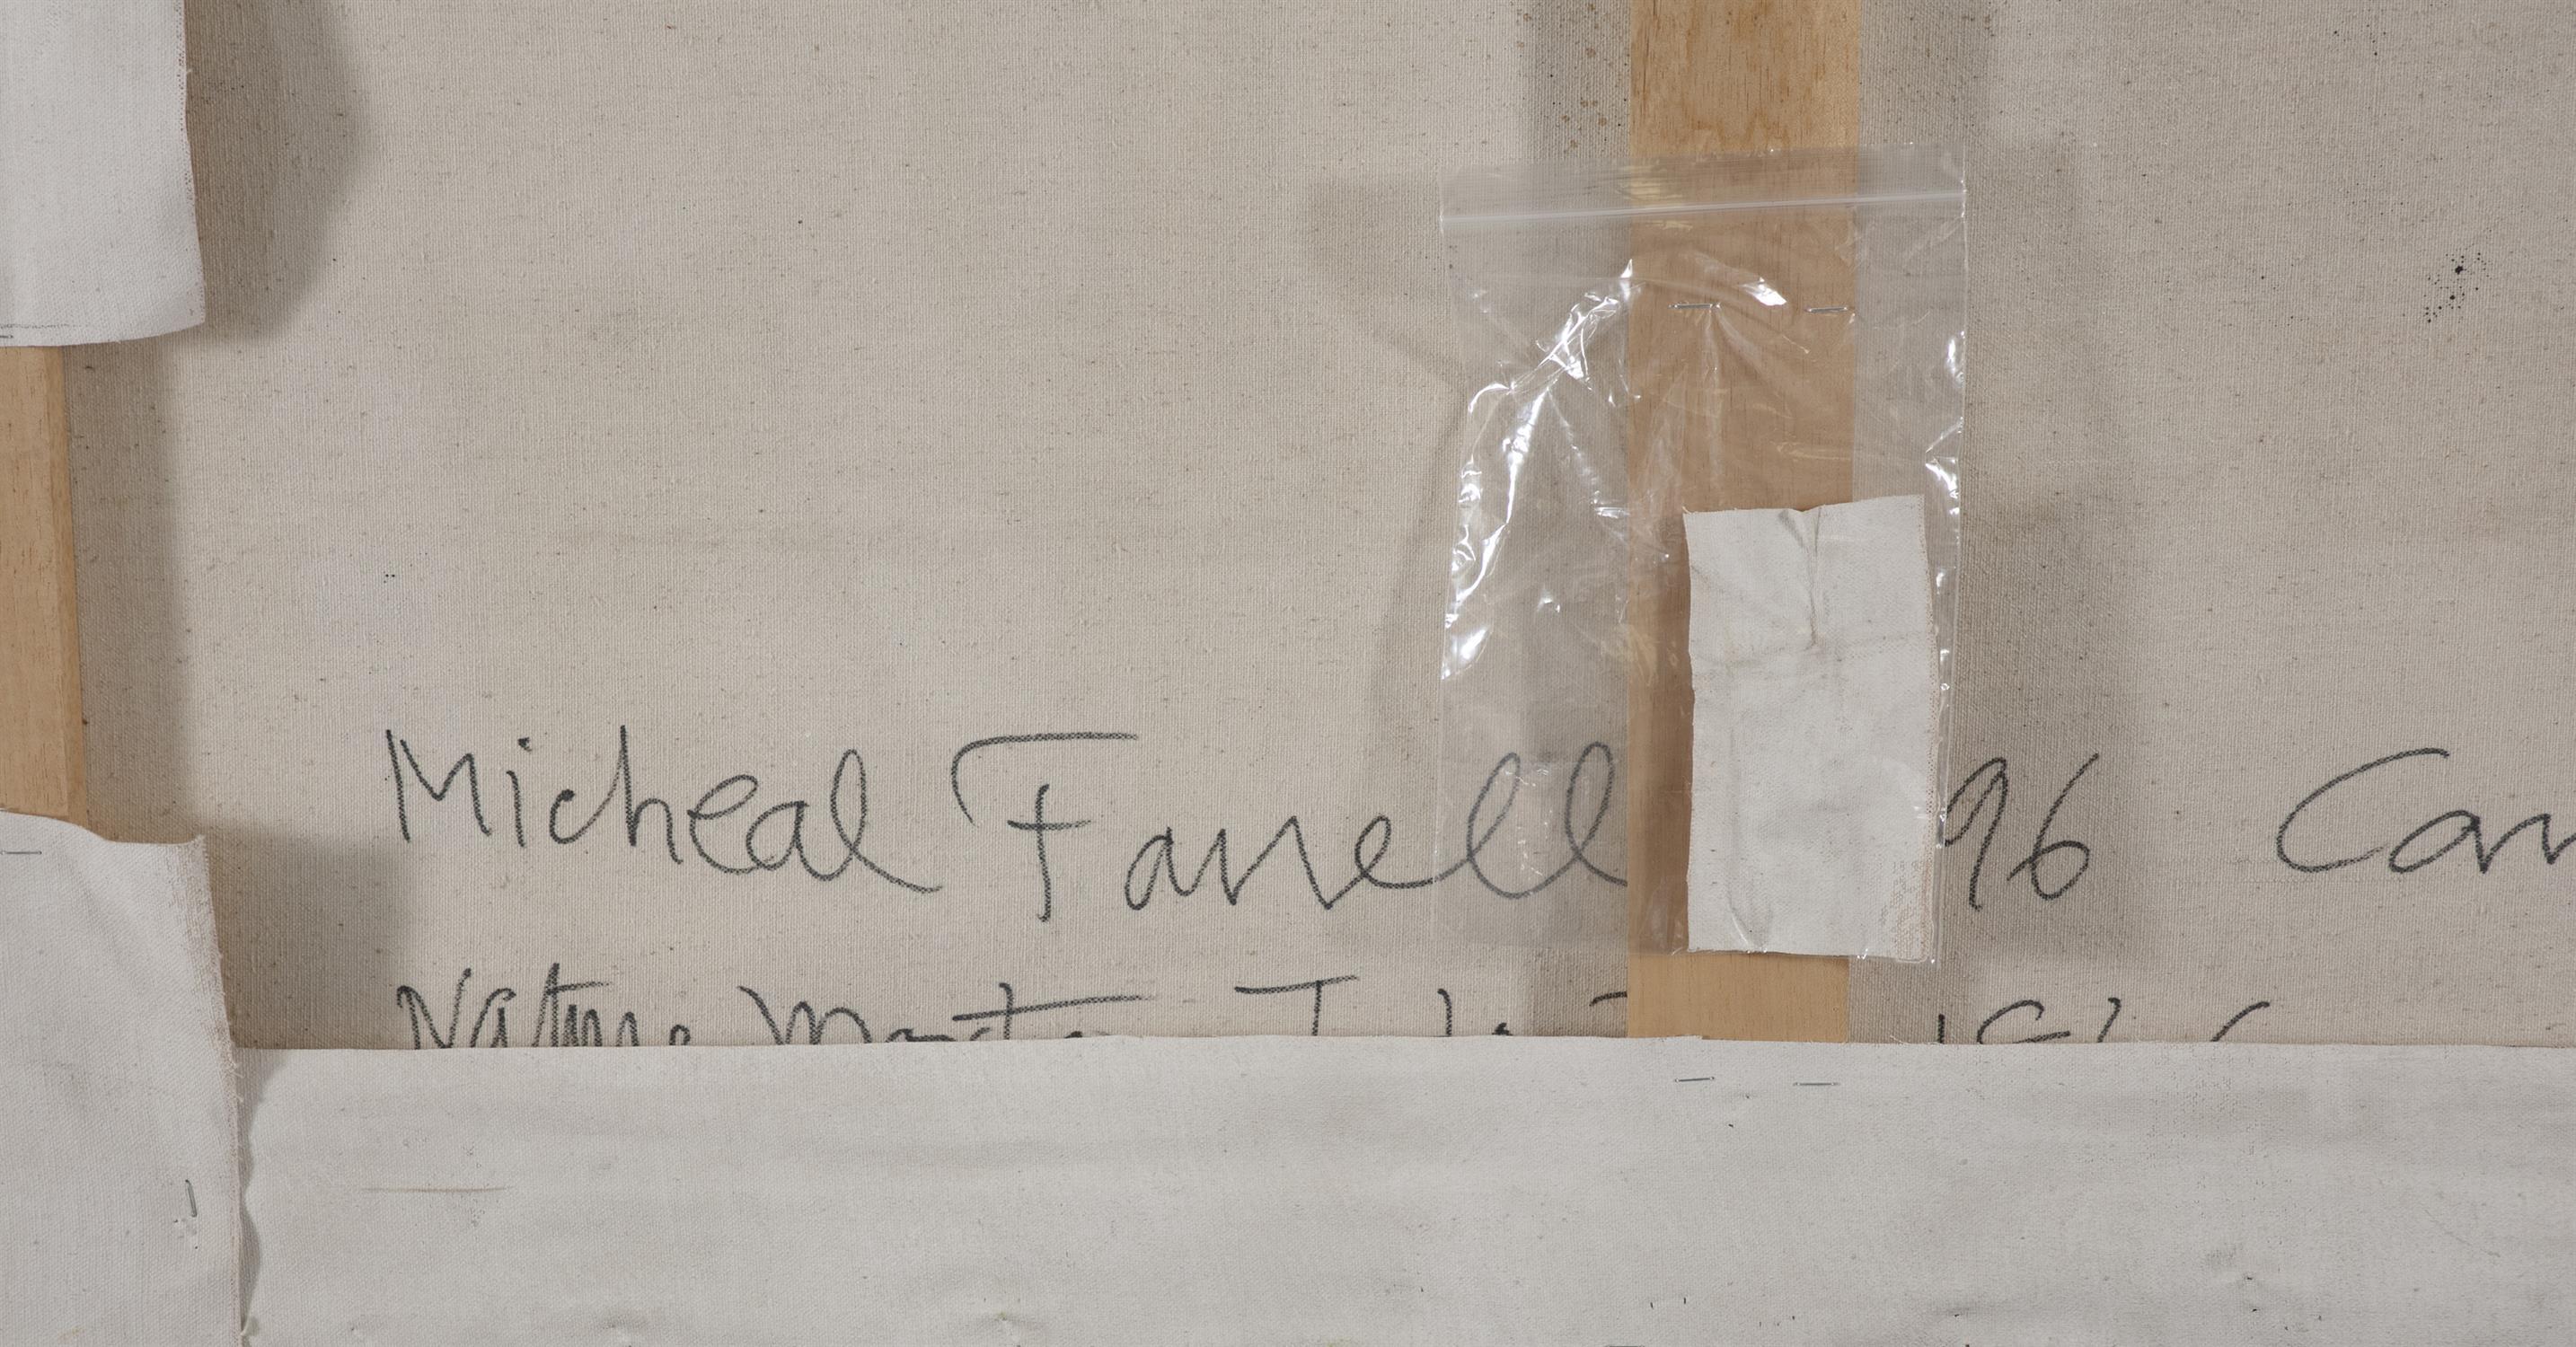 Michael Farrell (1940-2000) Nature Morte Irlande 1846 Oil on canvas, 114 x 167cm (44¾ x - Image 3 of 4